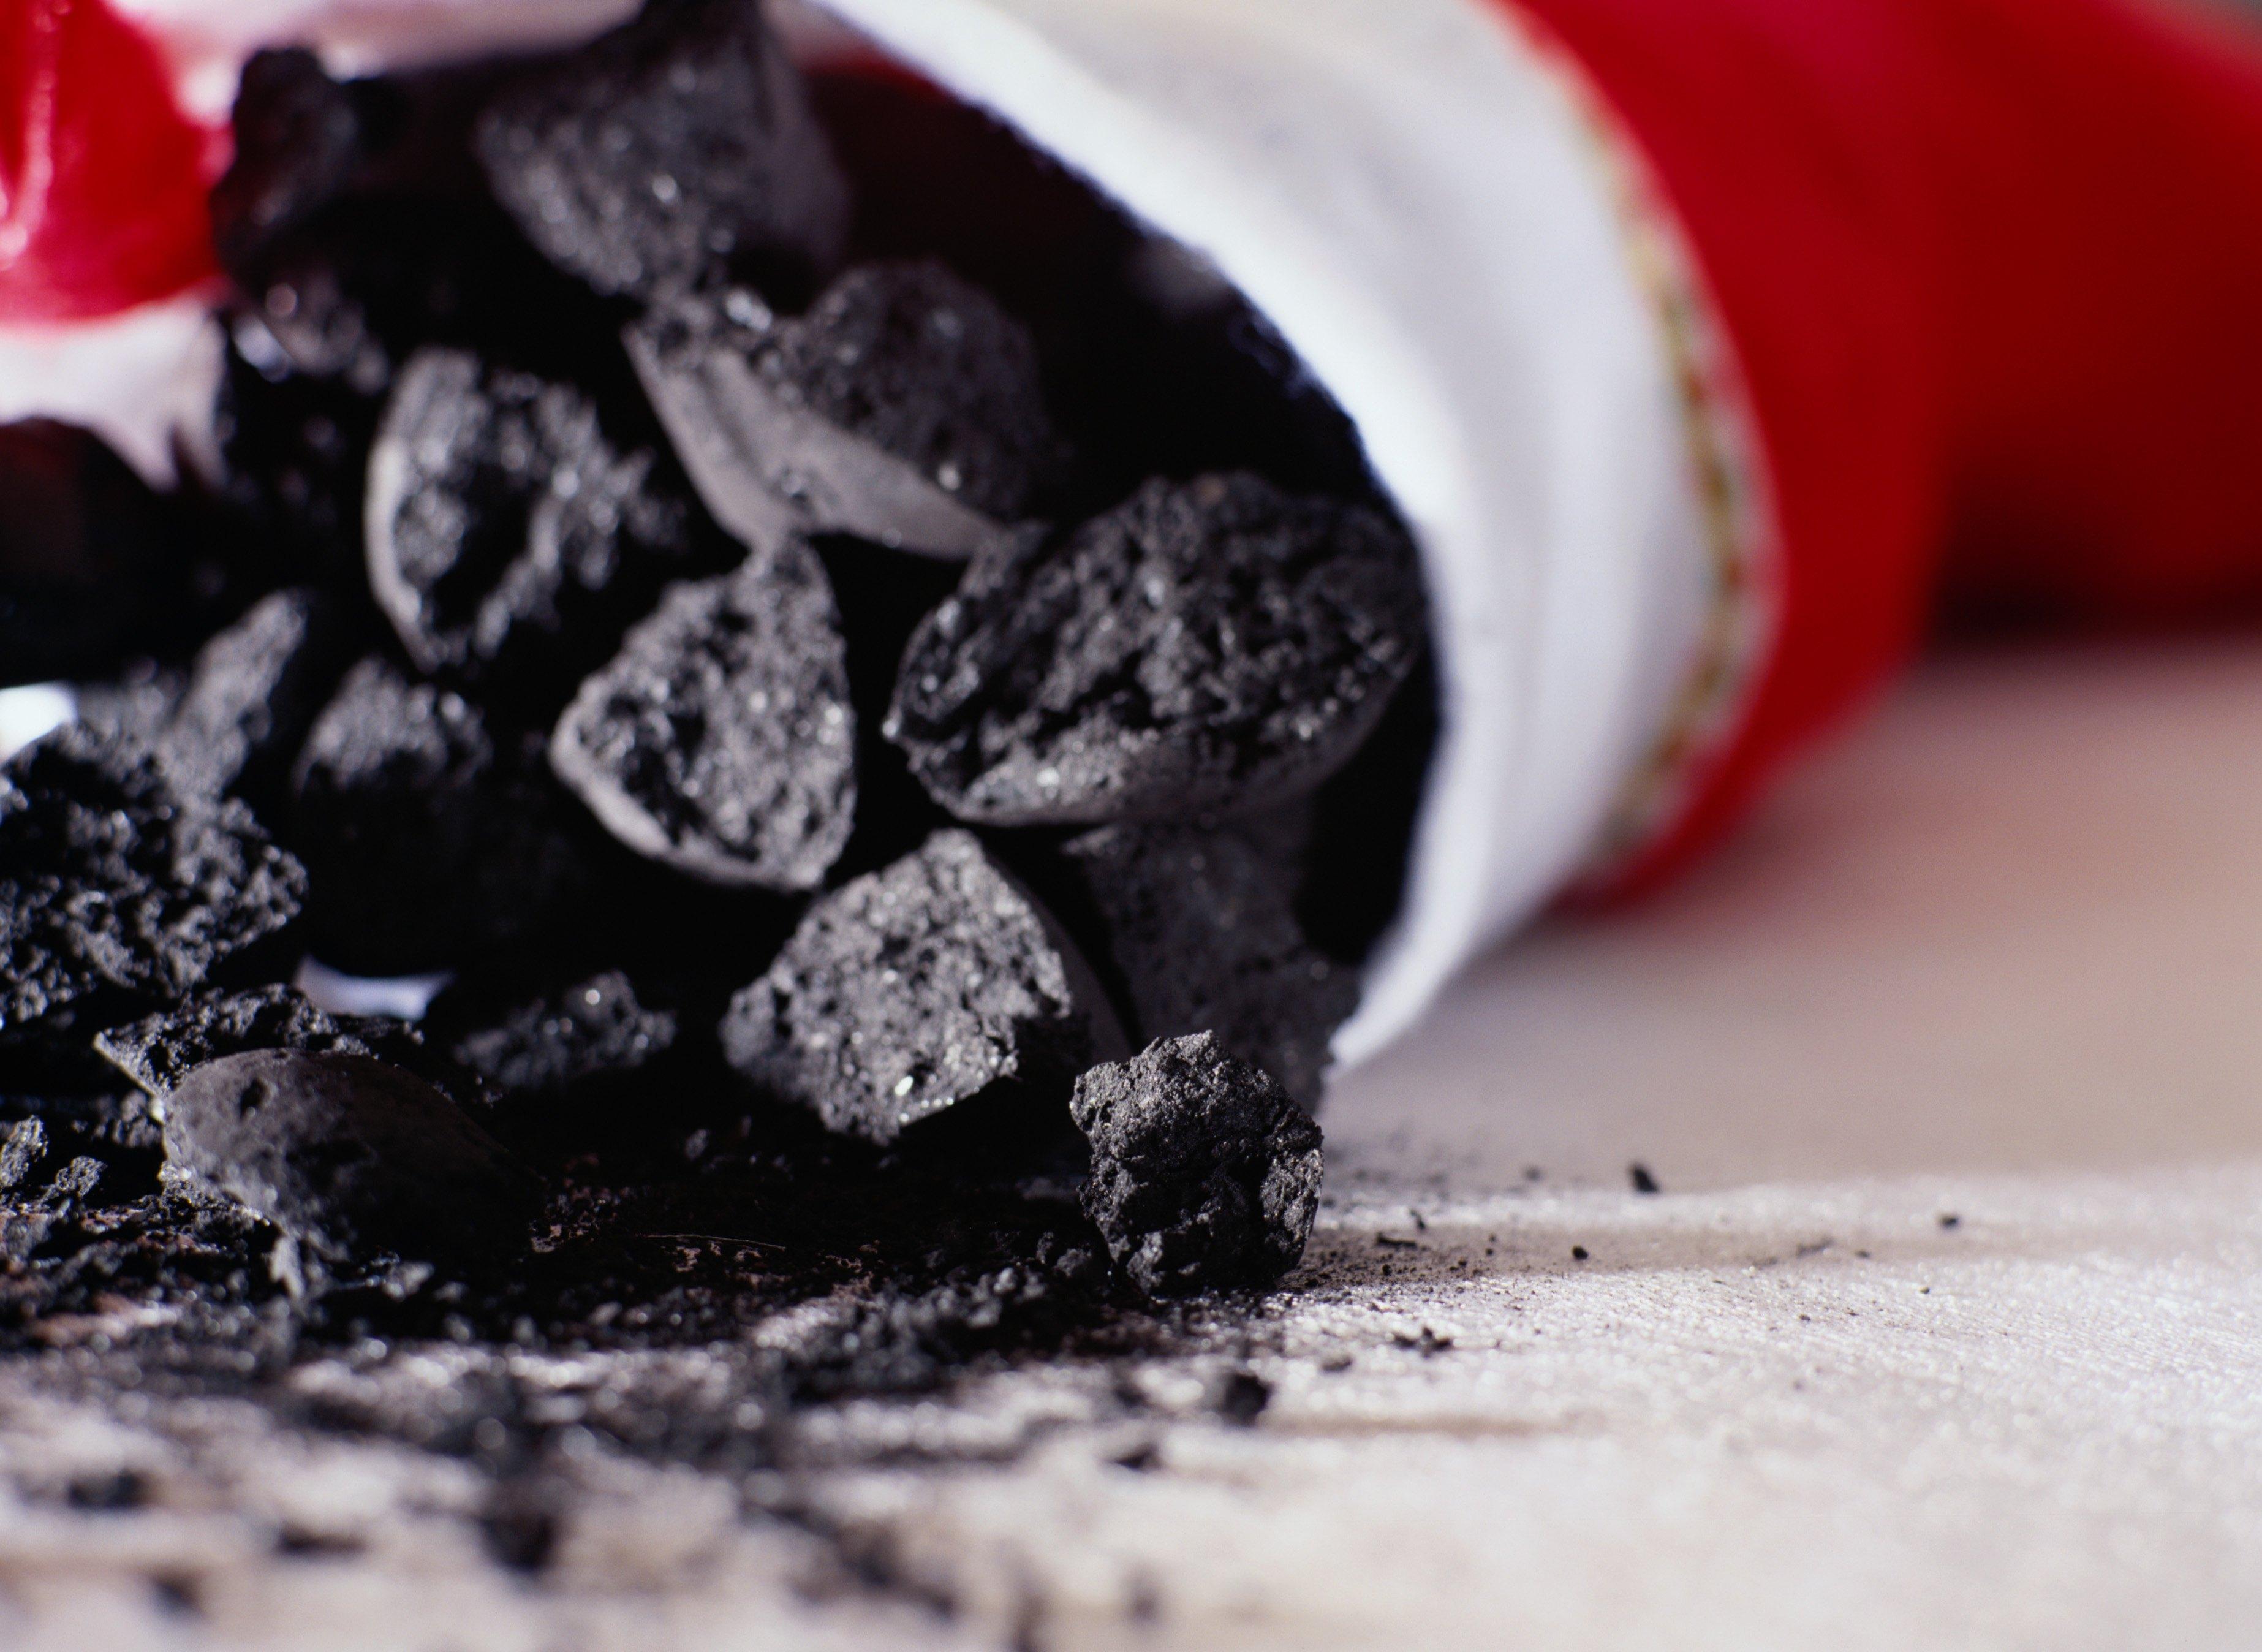 Origin of Lumps of Coal for Christmas | eHow